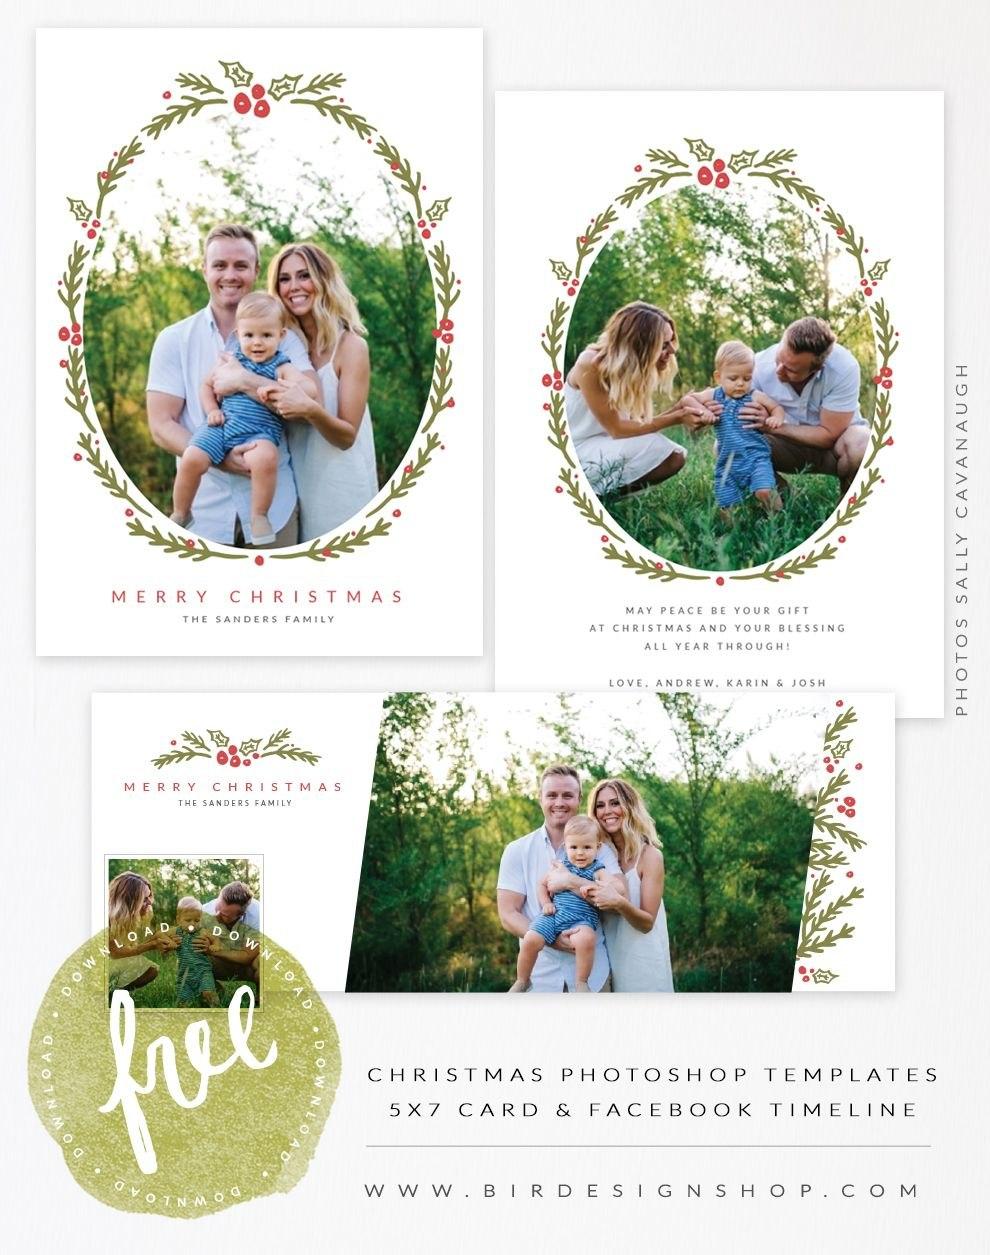 August Freebie  Christmas Card  Fb Timeline Templates  Free In Free Photoshop Christmas Card Templates For Photographers